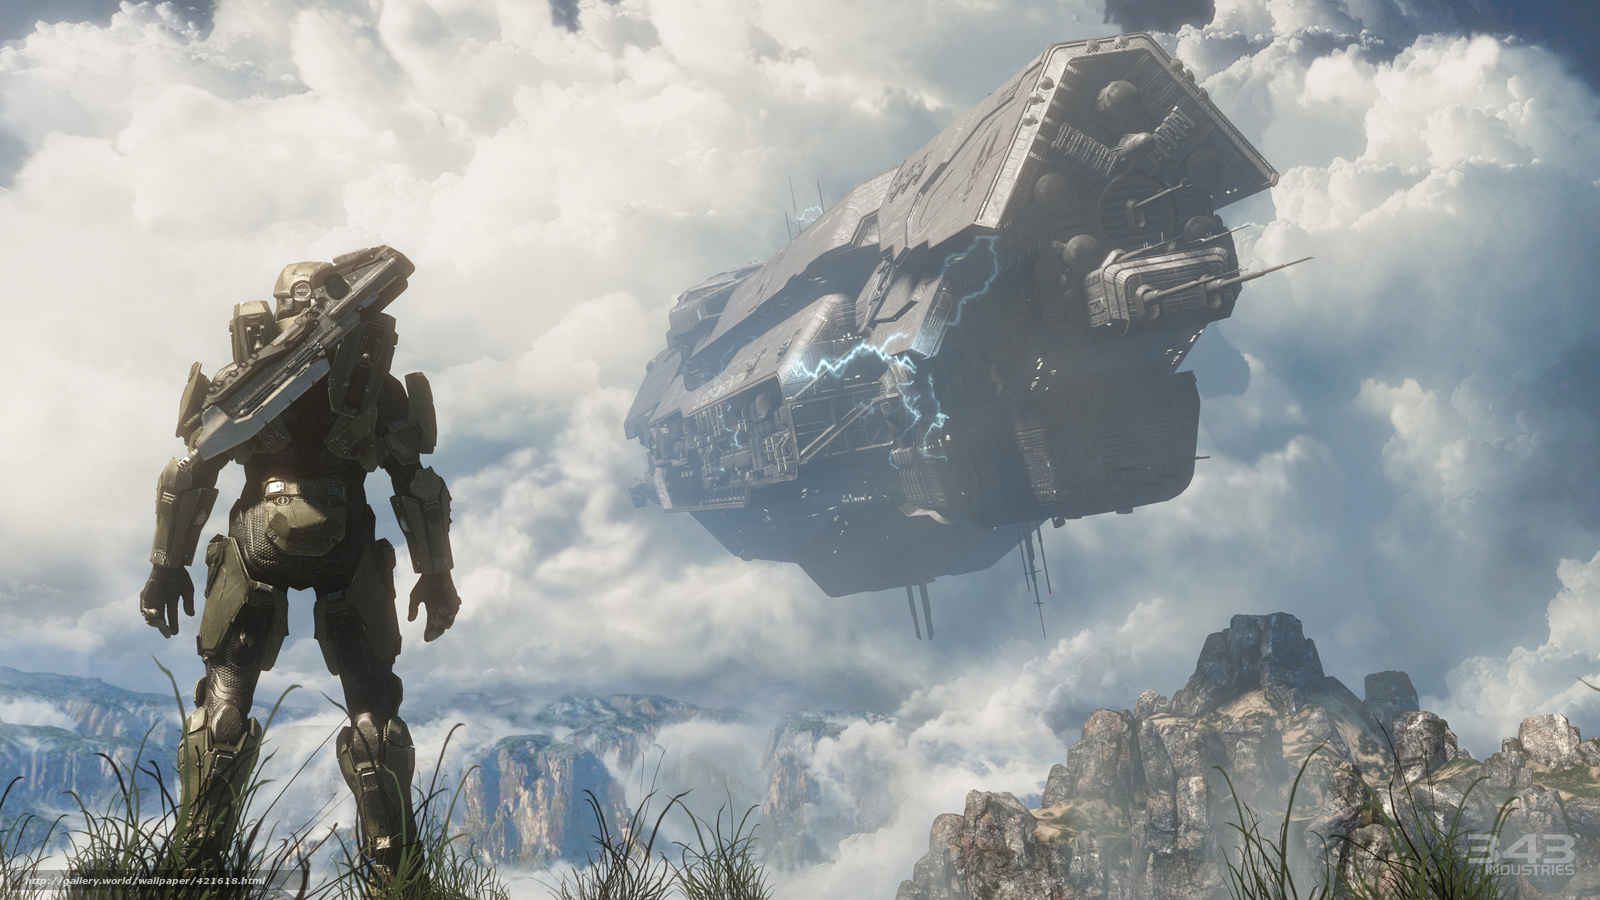 Game Ship Halo 4